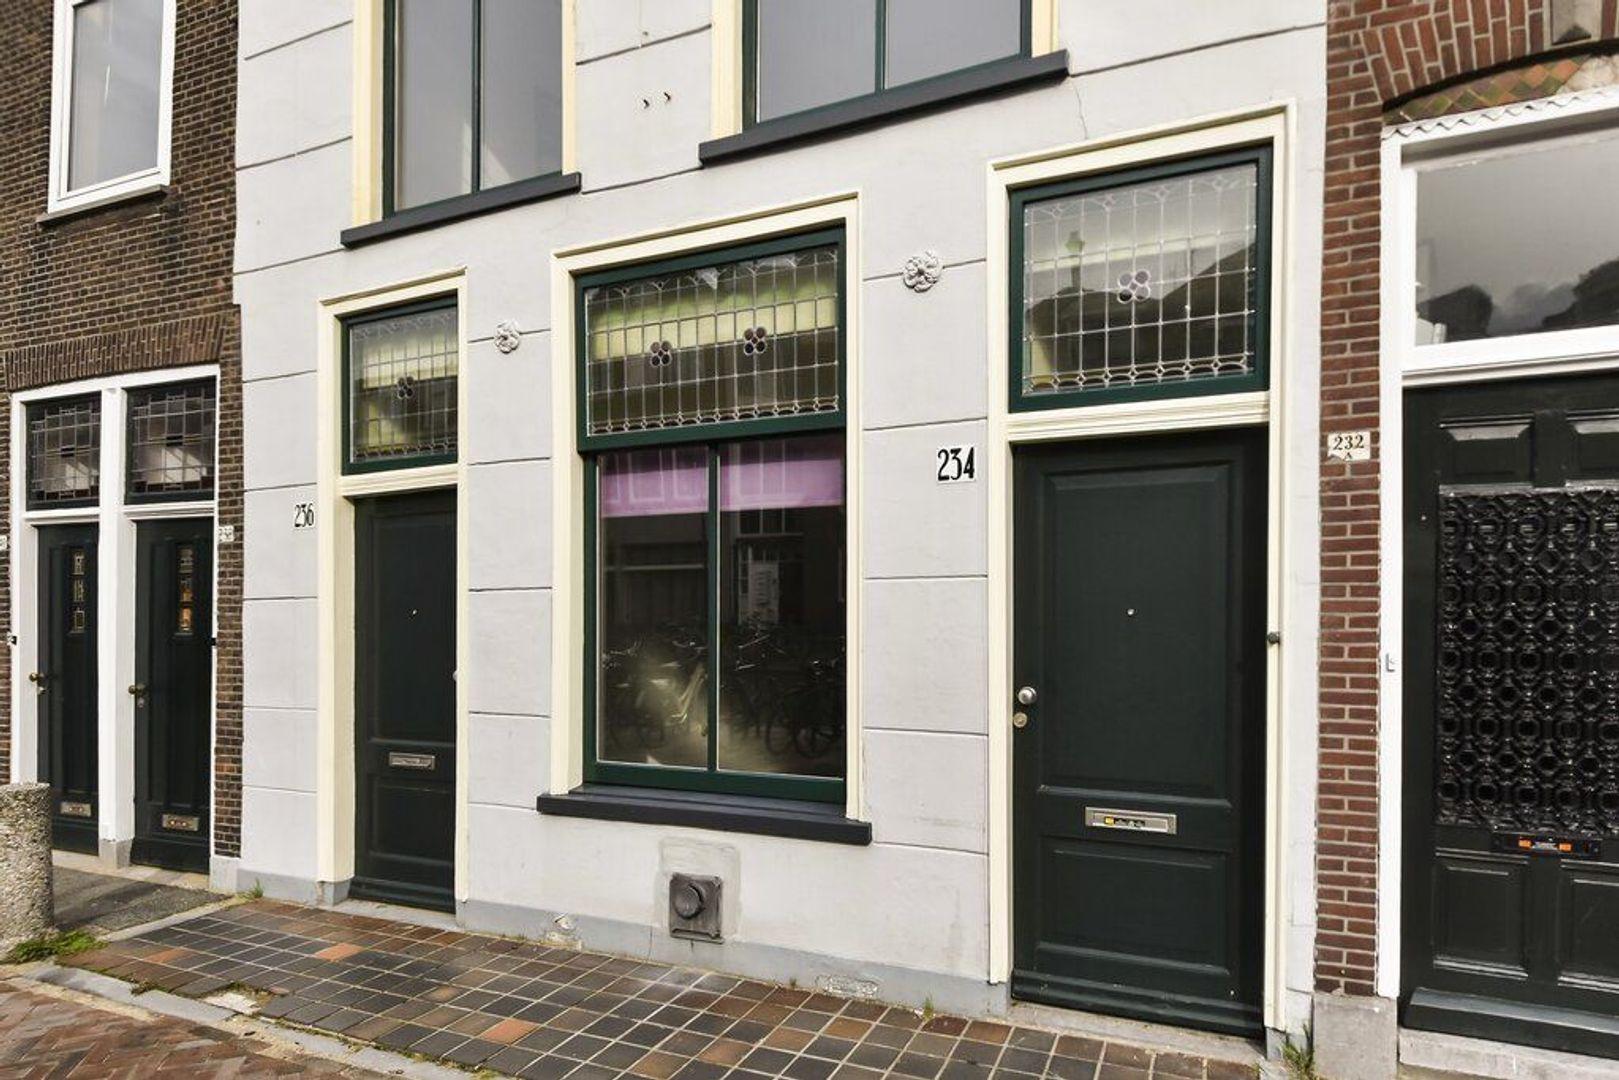 Oosteinde 234, Delft foto-4